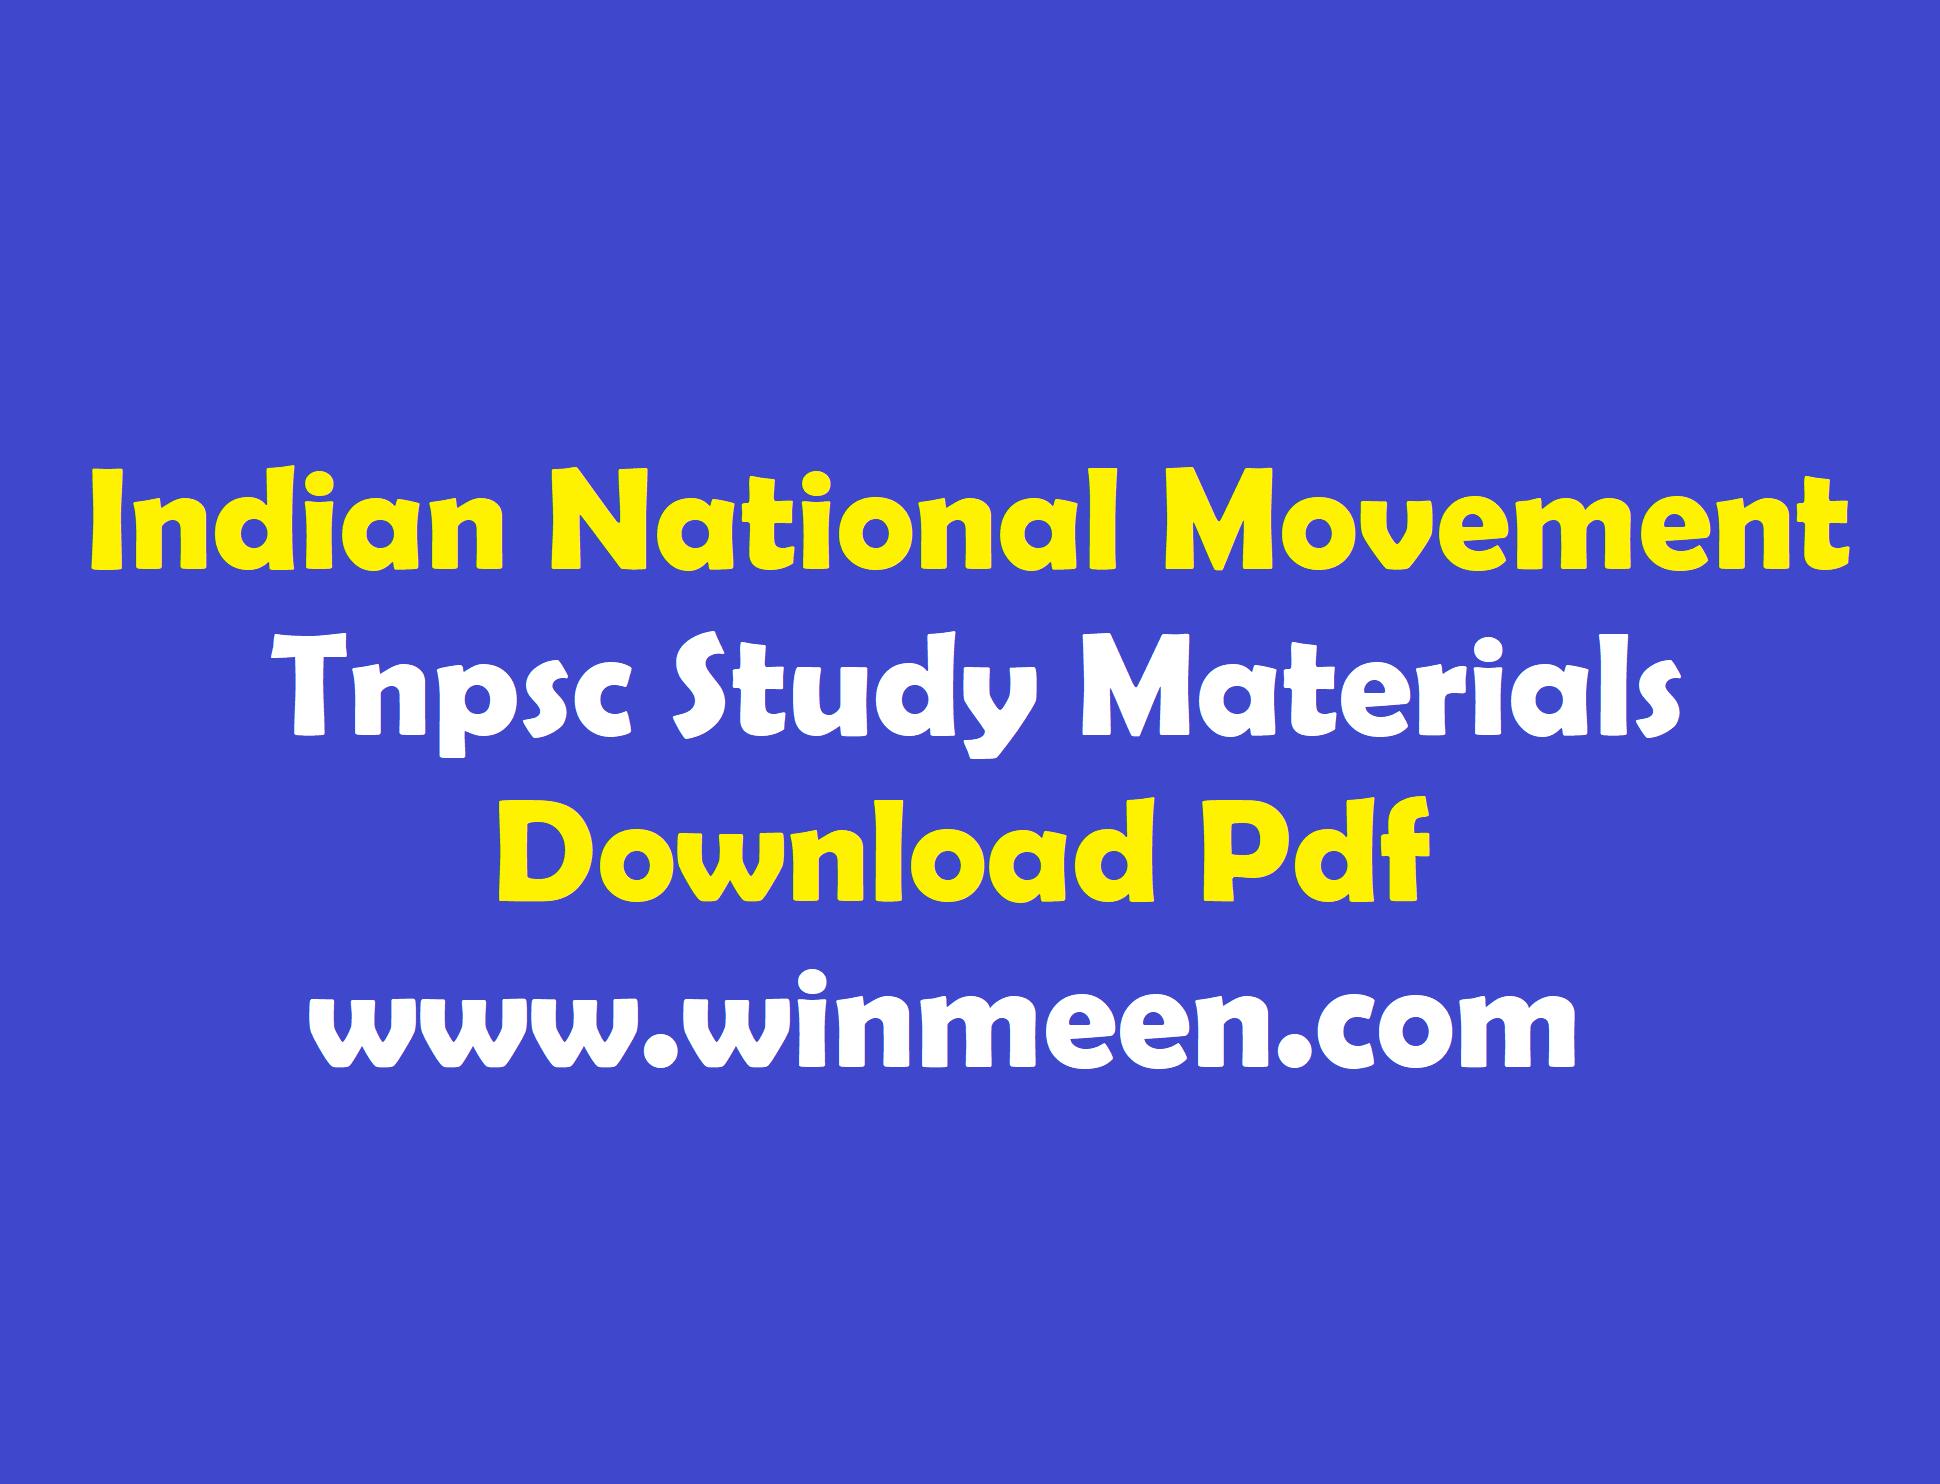 Indian National Movement Mcq Pdf